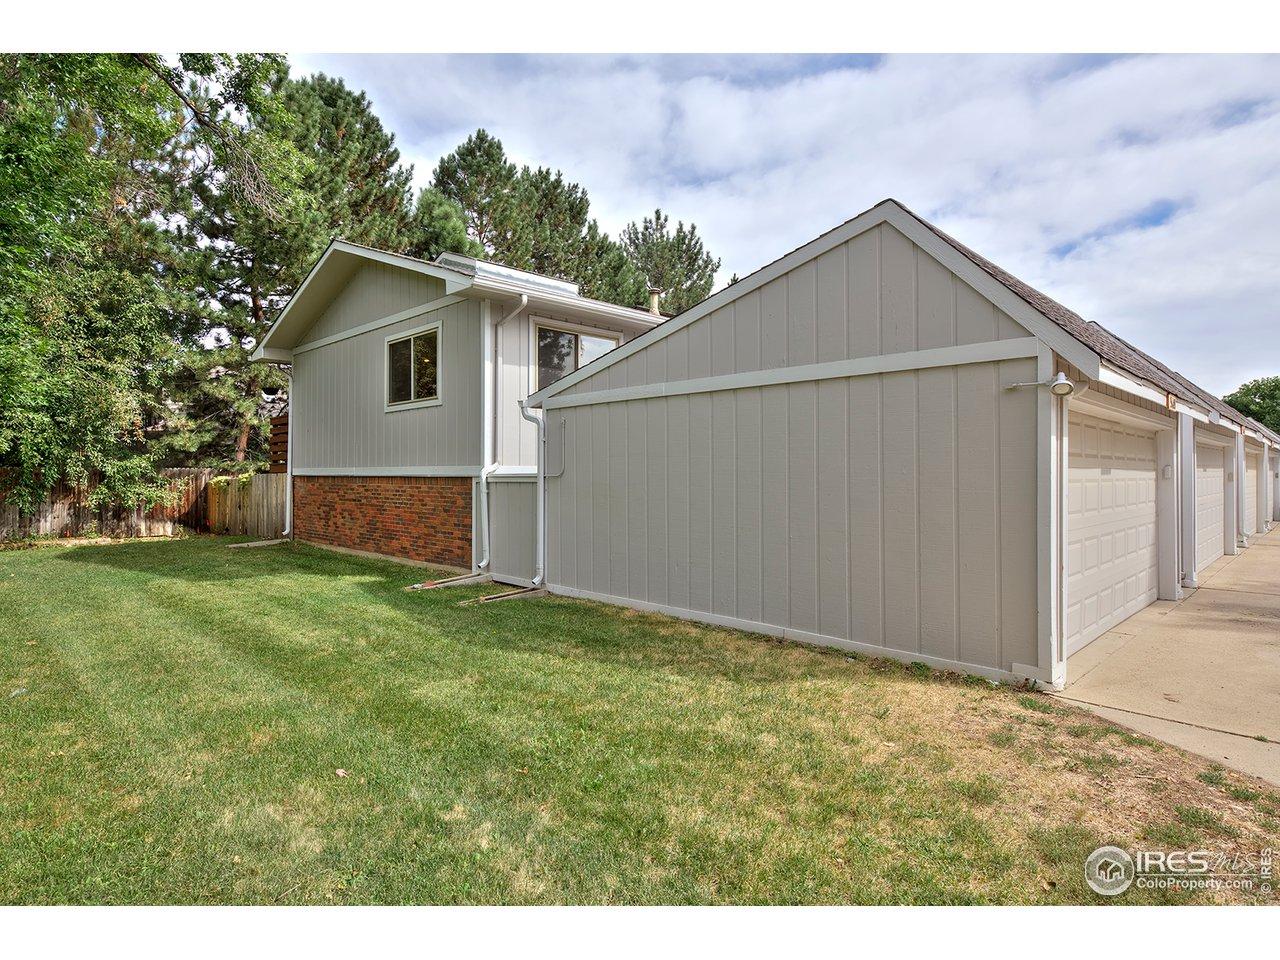 5401 White Pl, Boulder CO 80303